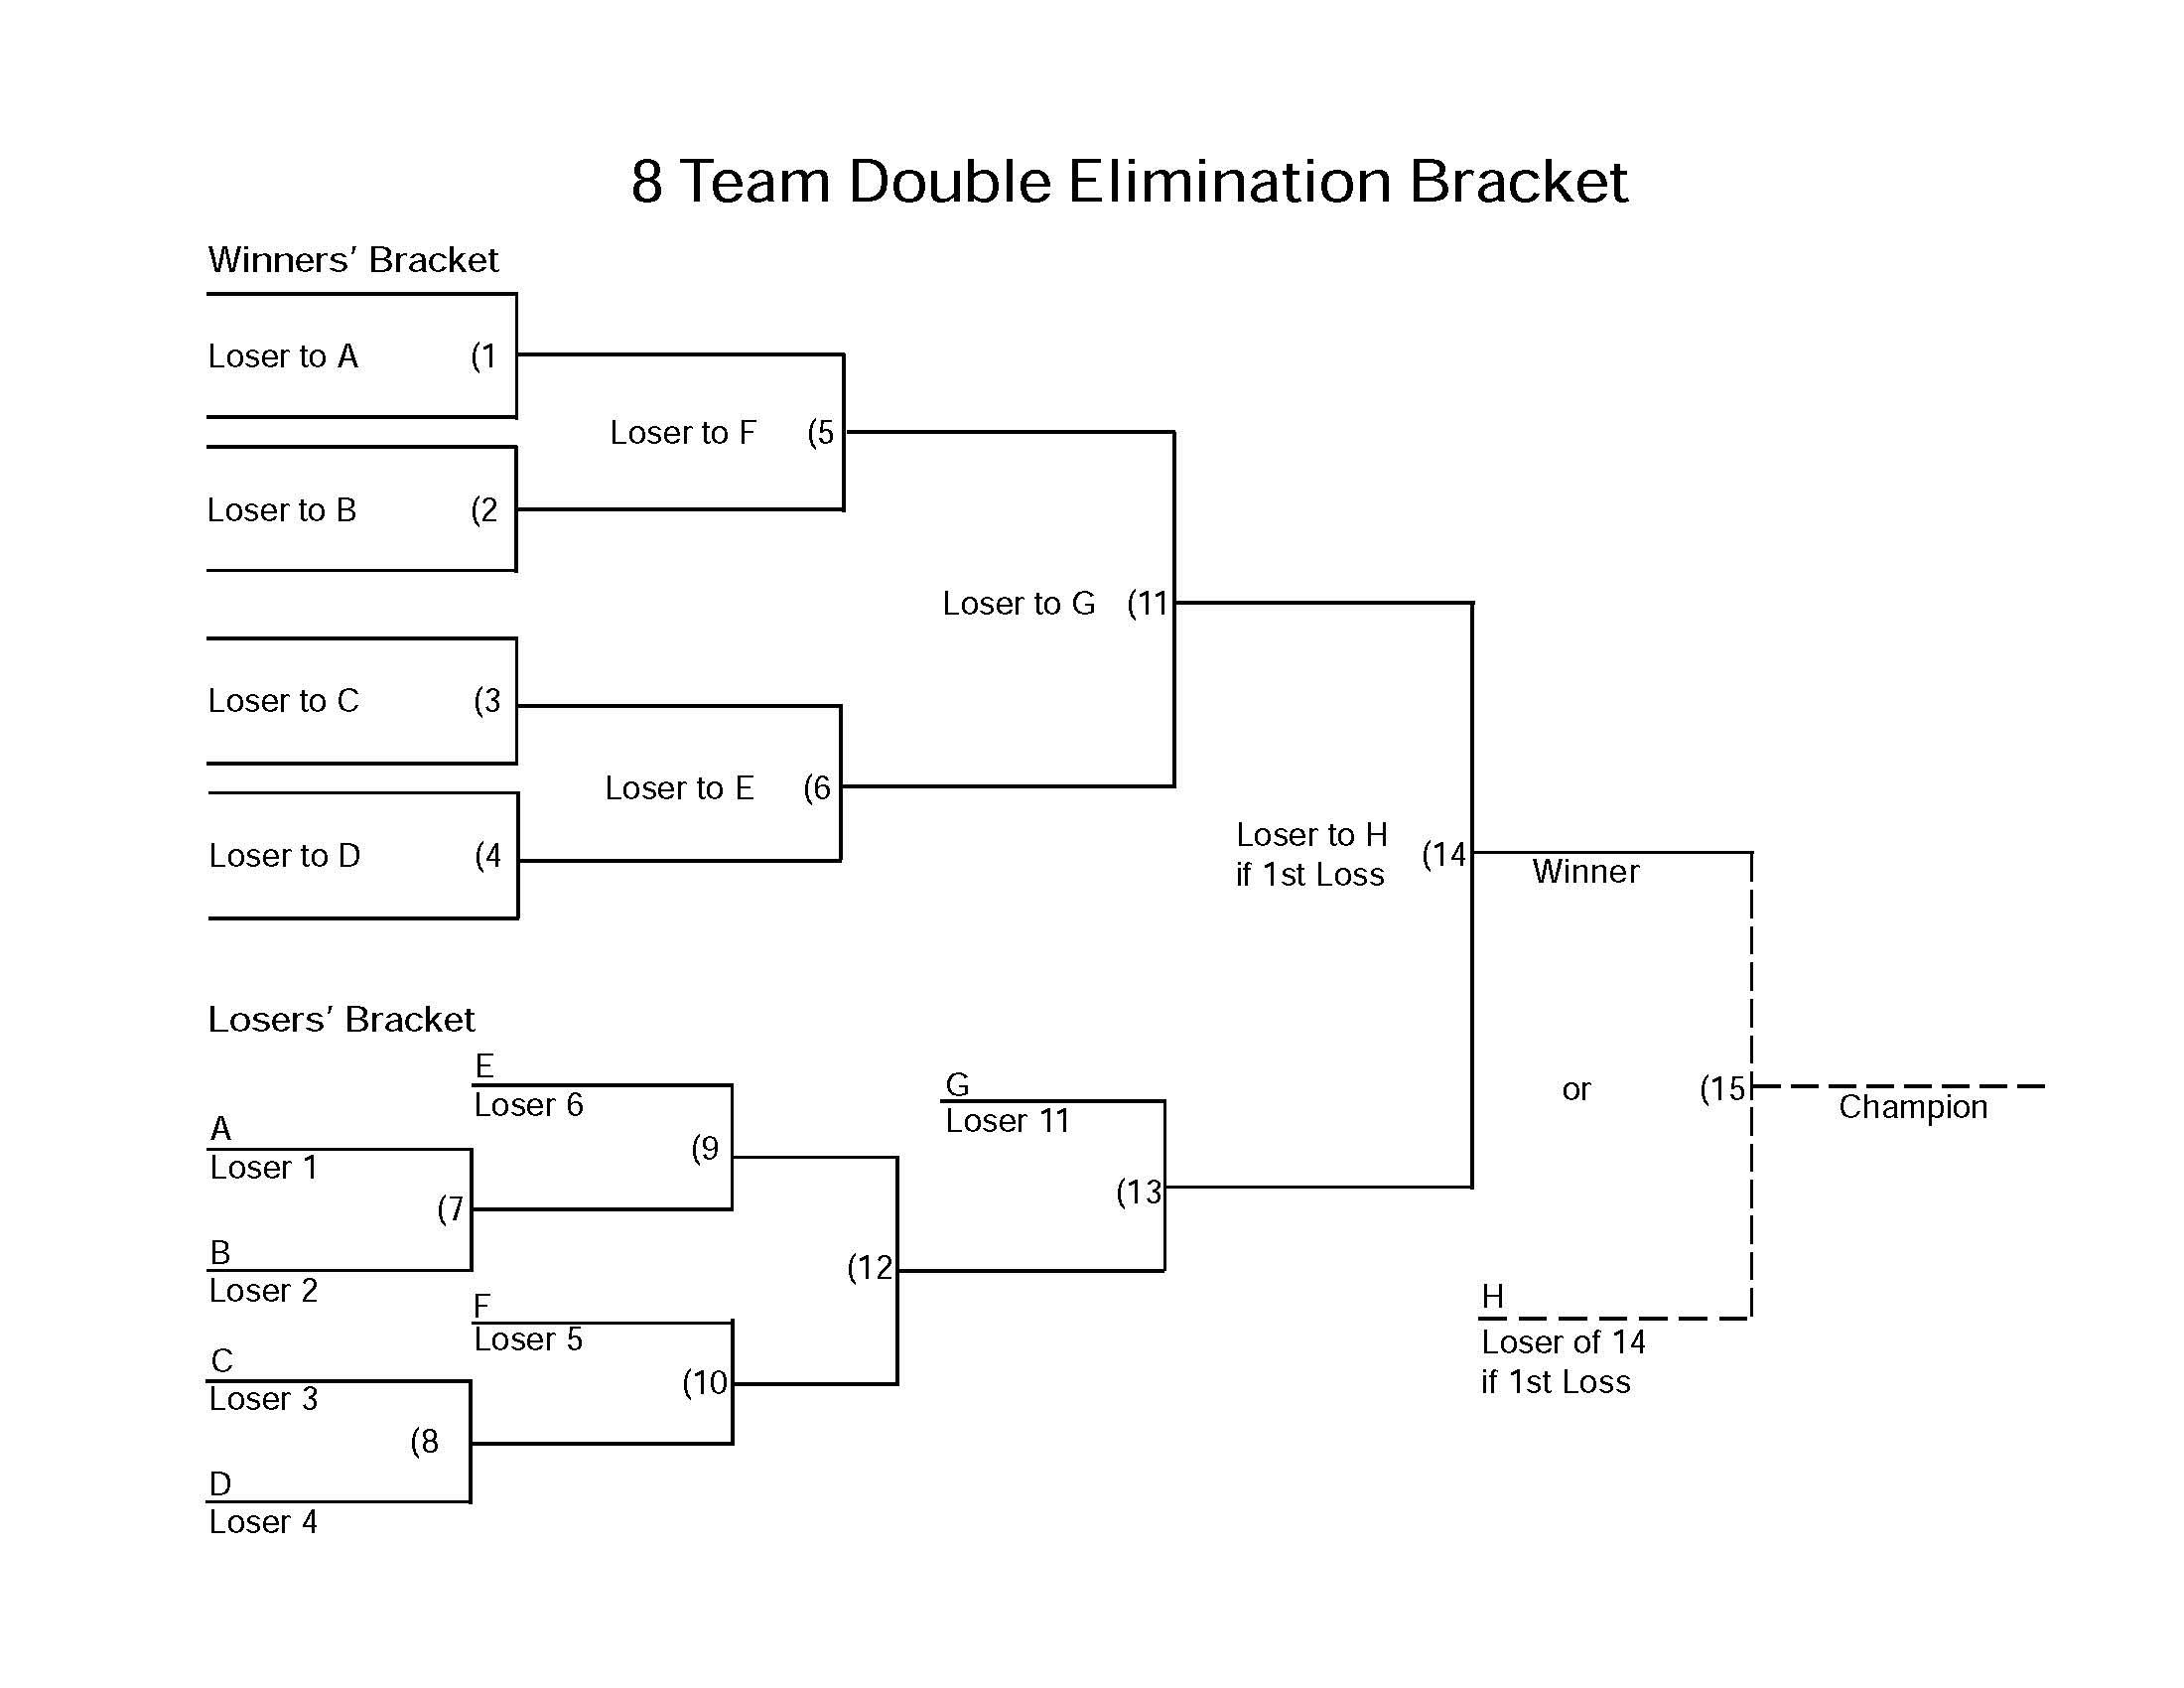 8team_double_elimination.jpg